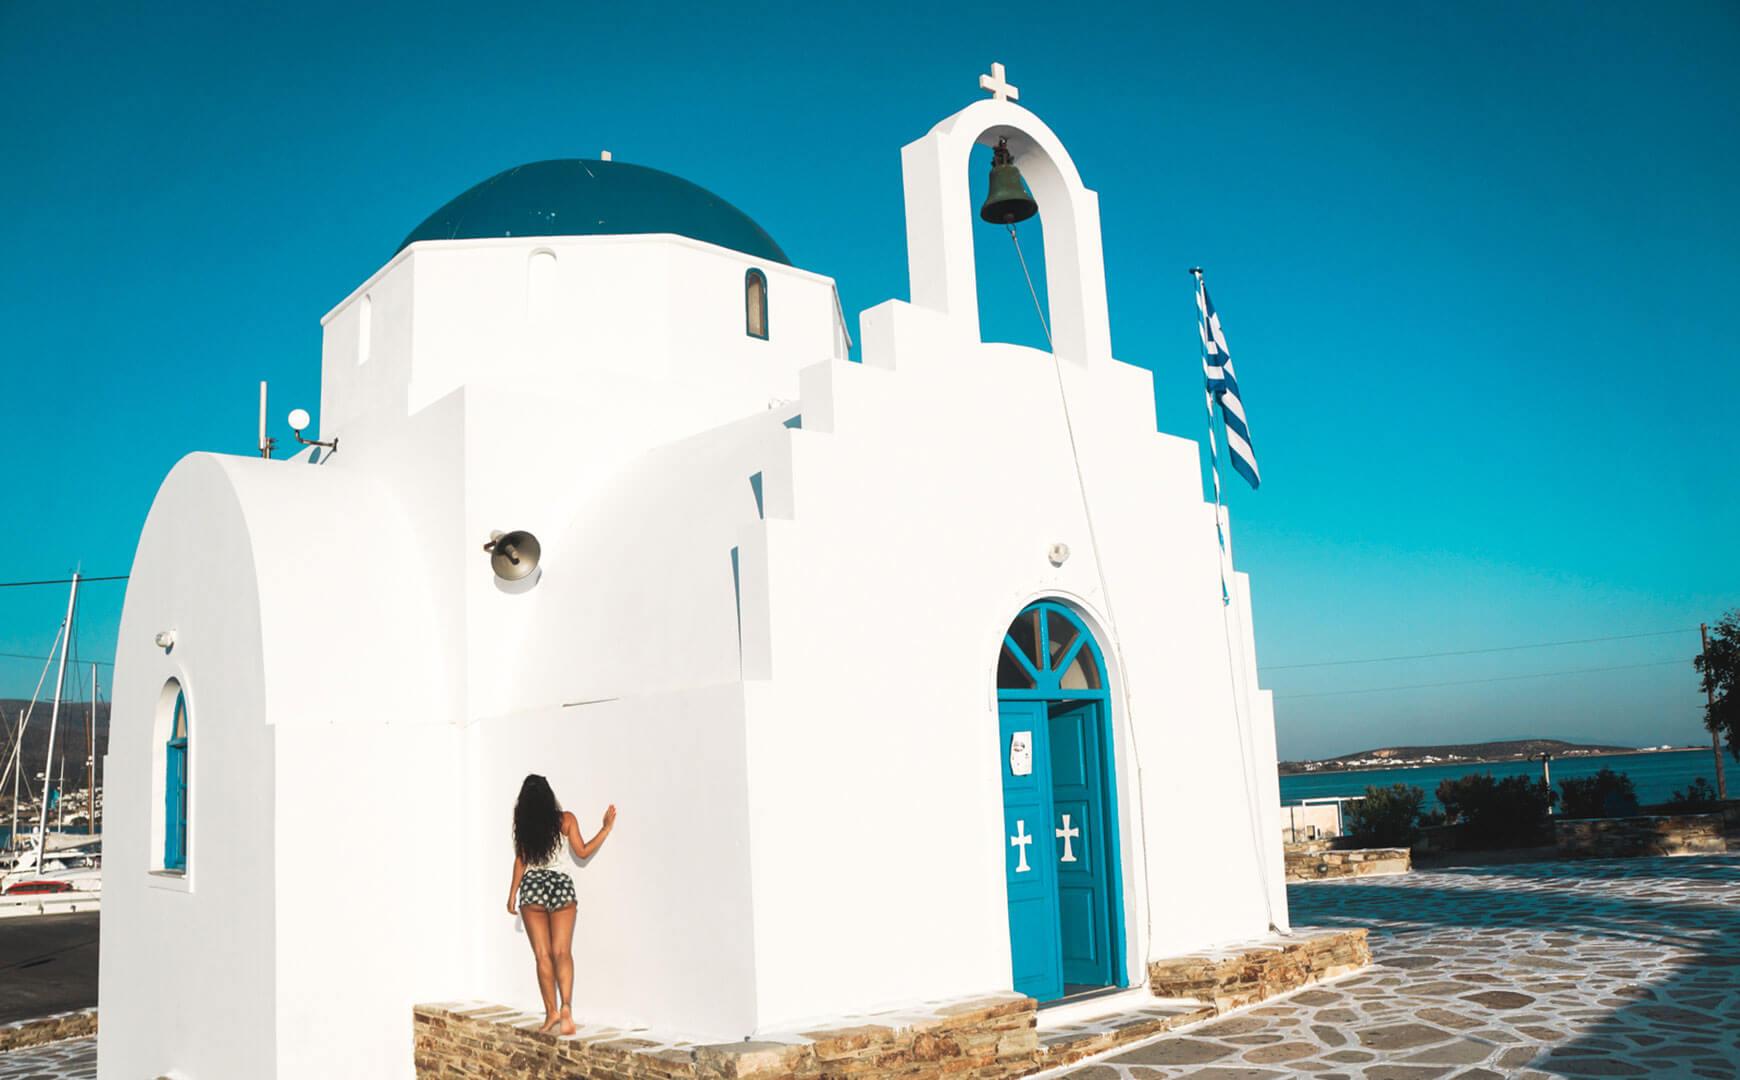 antiparos-greece-la-vie-en-blog-all-rights-reserved-103